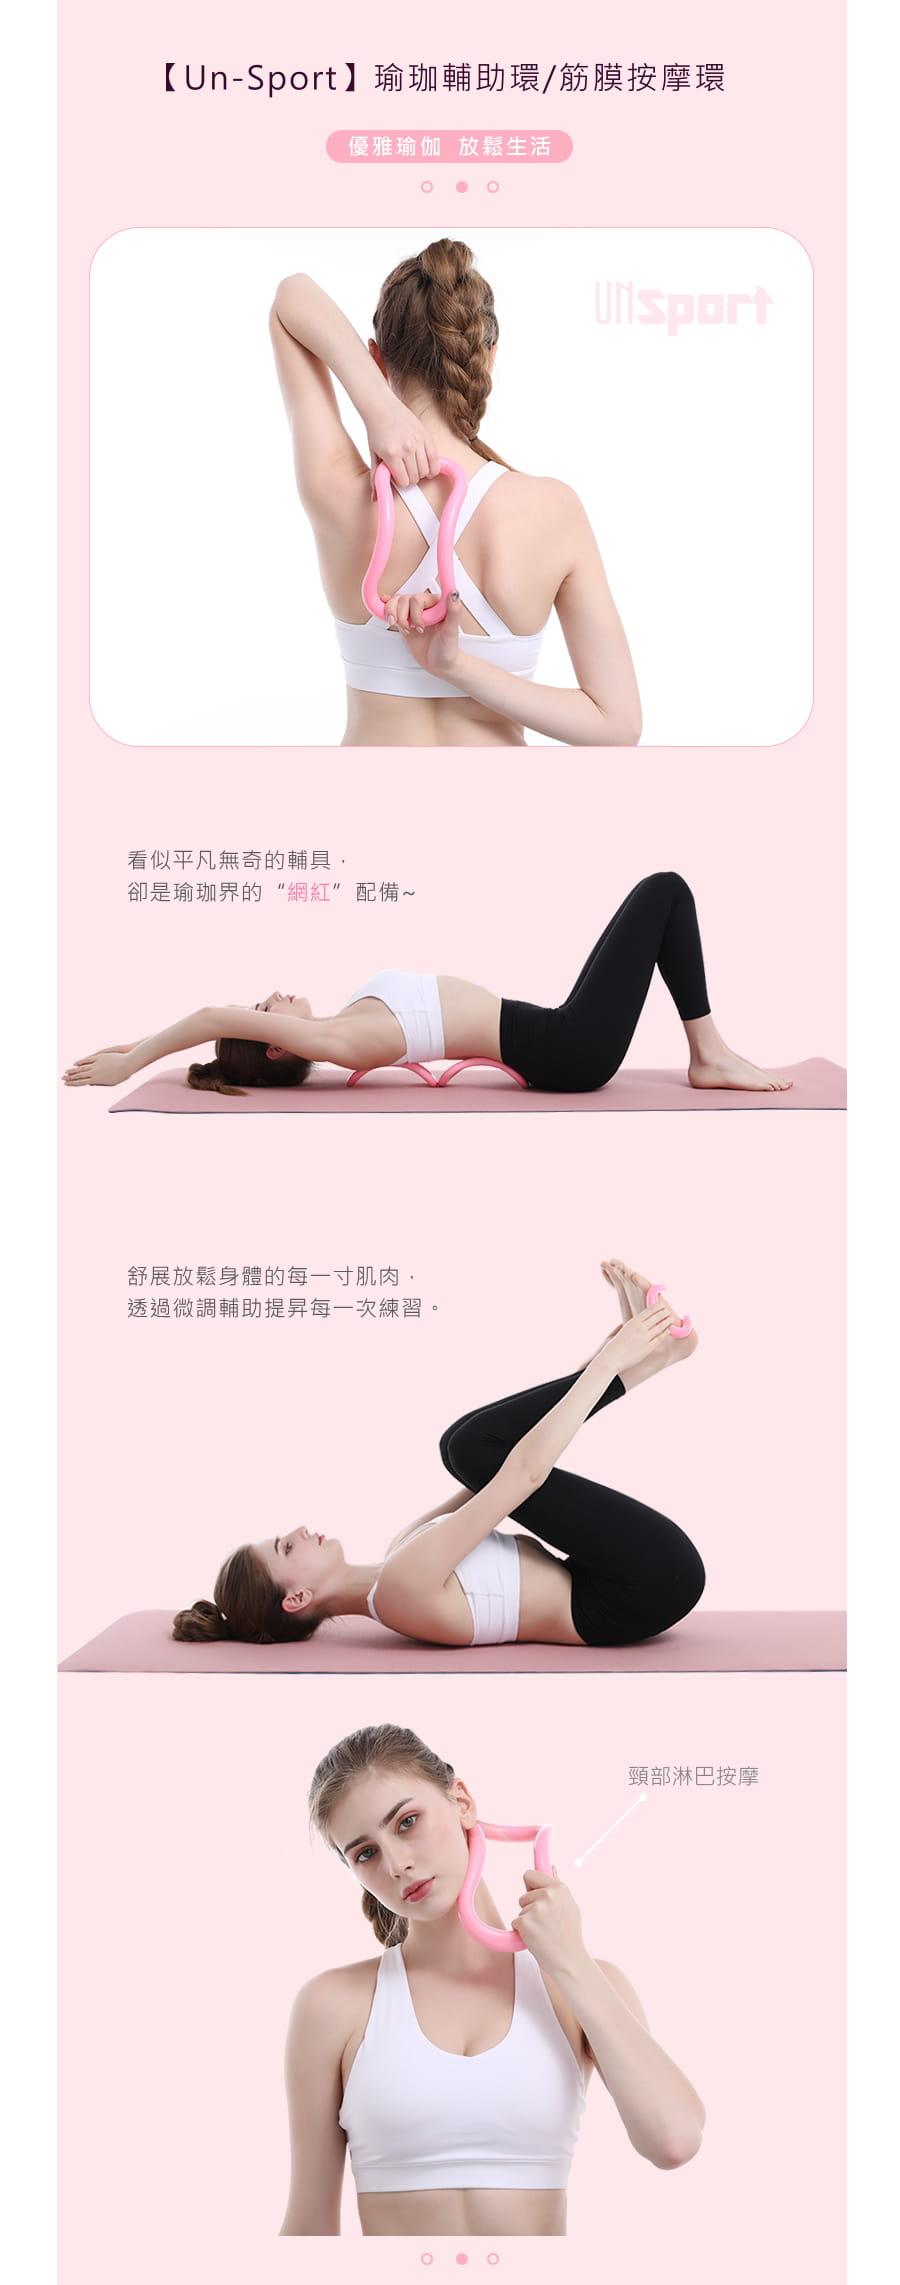 【Un-Sport高機能】健身按摩瑜珈環/開肩瘦背/普拉提斯伸展環-超值2入 1